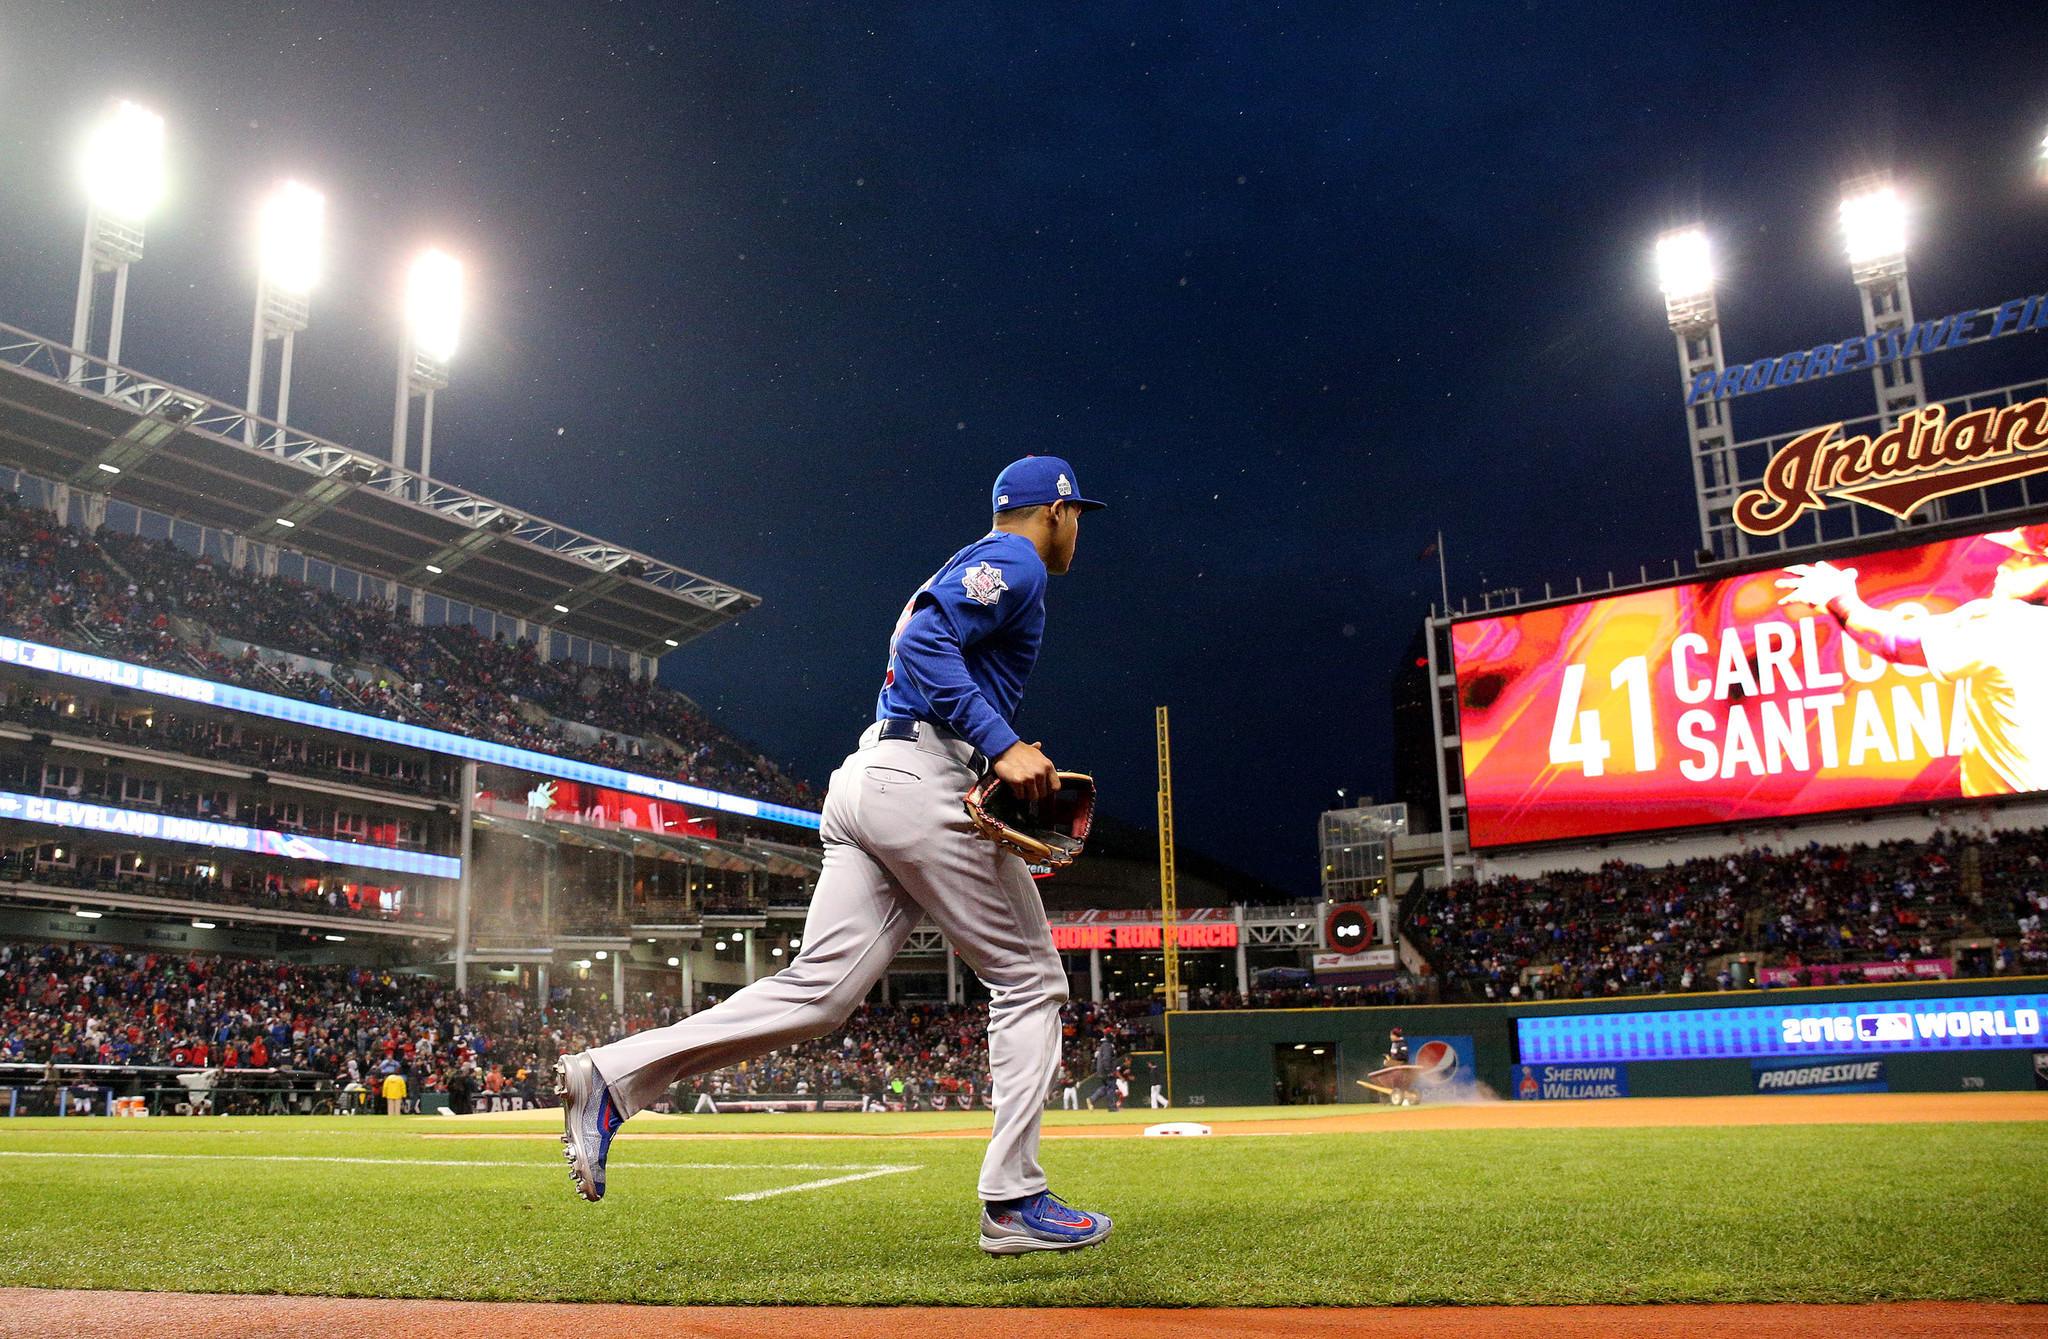 Cubs Indians Game 2 Ticket Prices Plunge Chicago Tribune